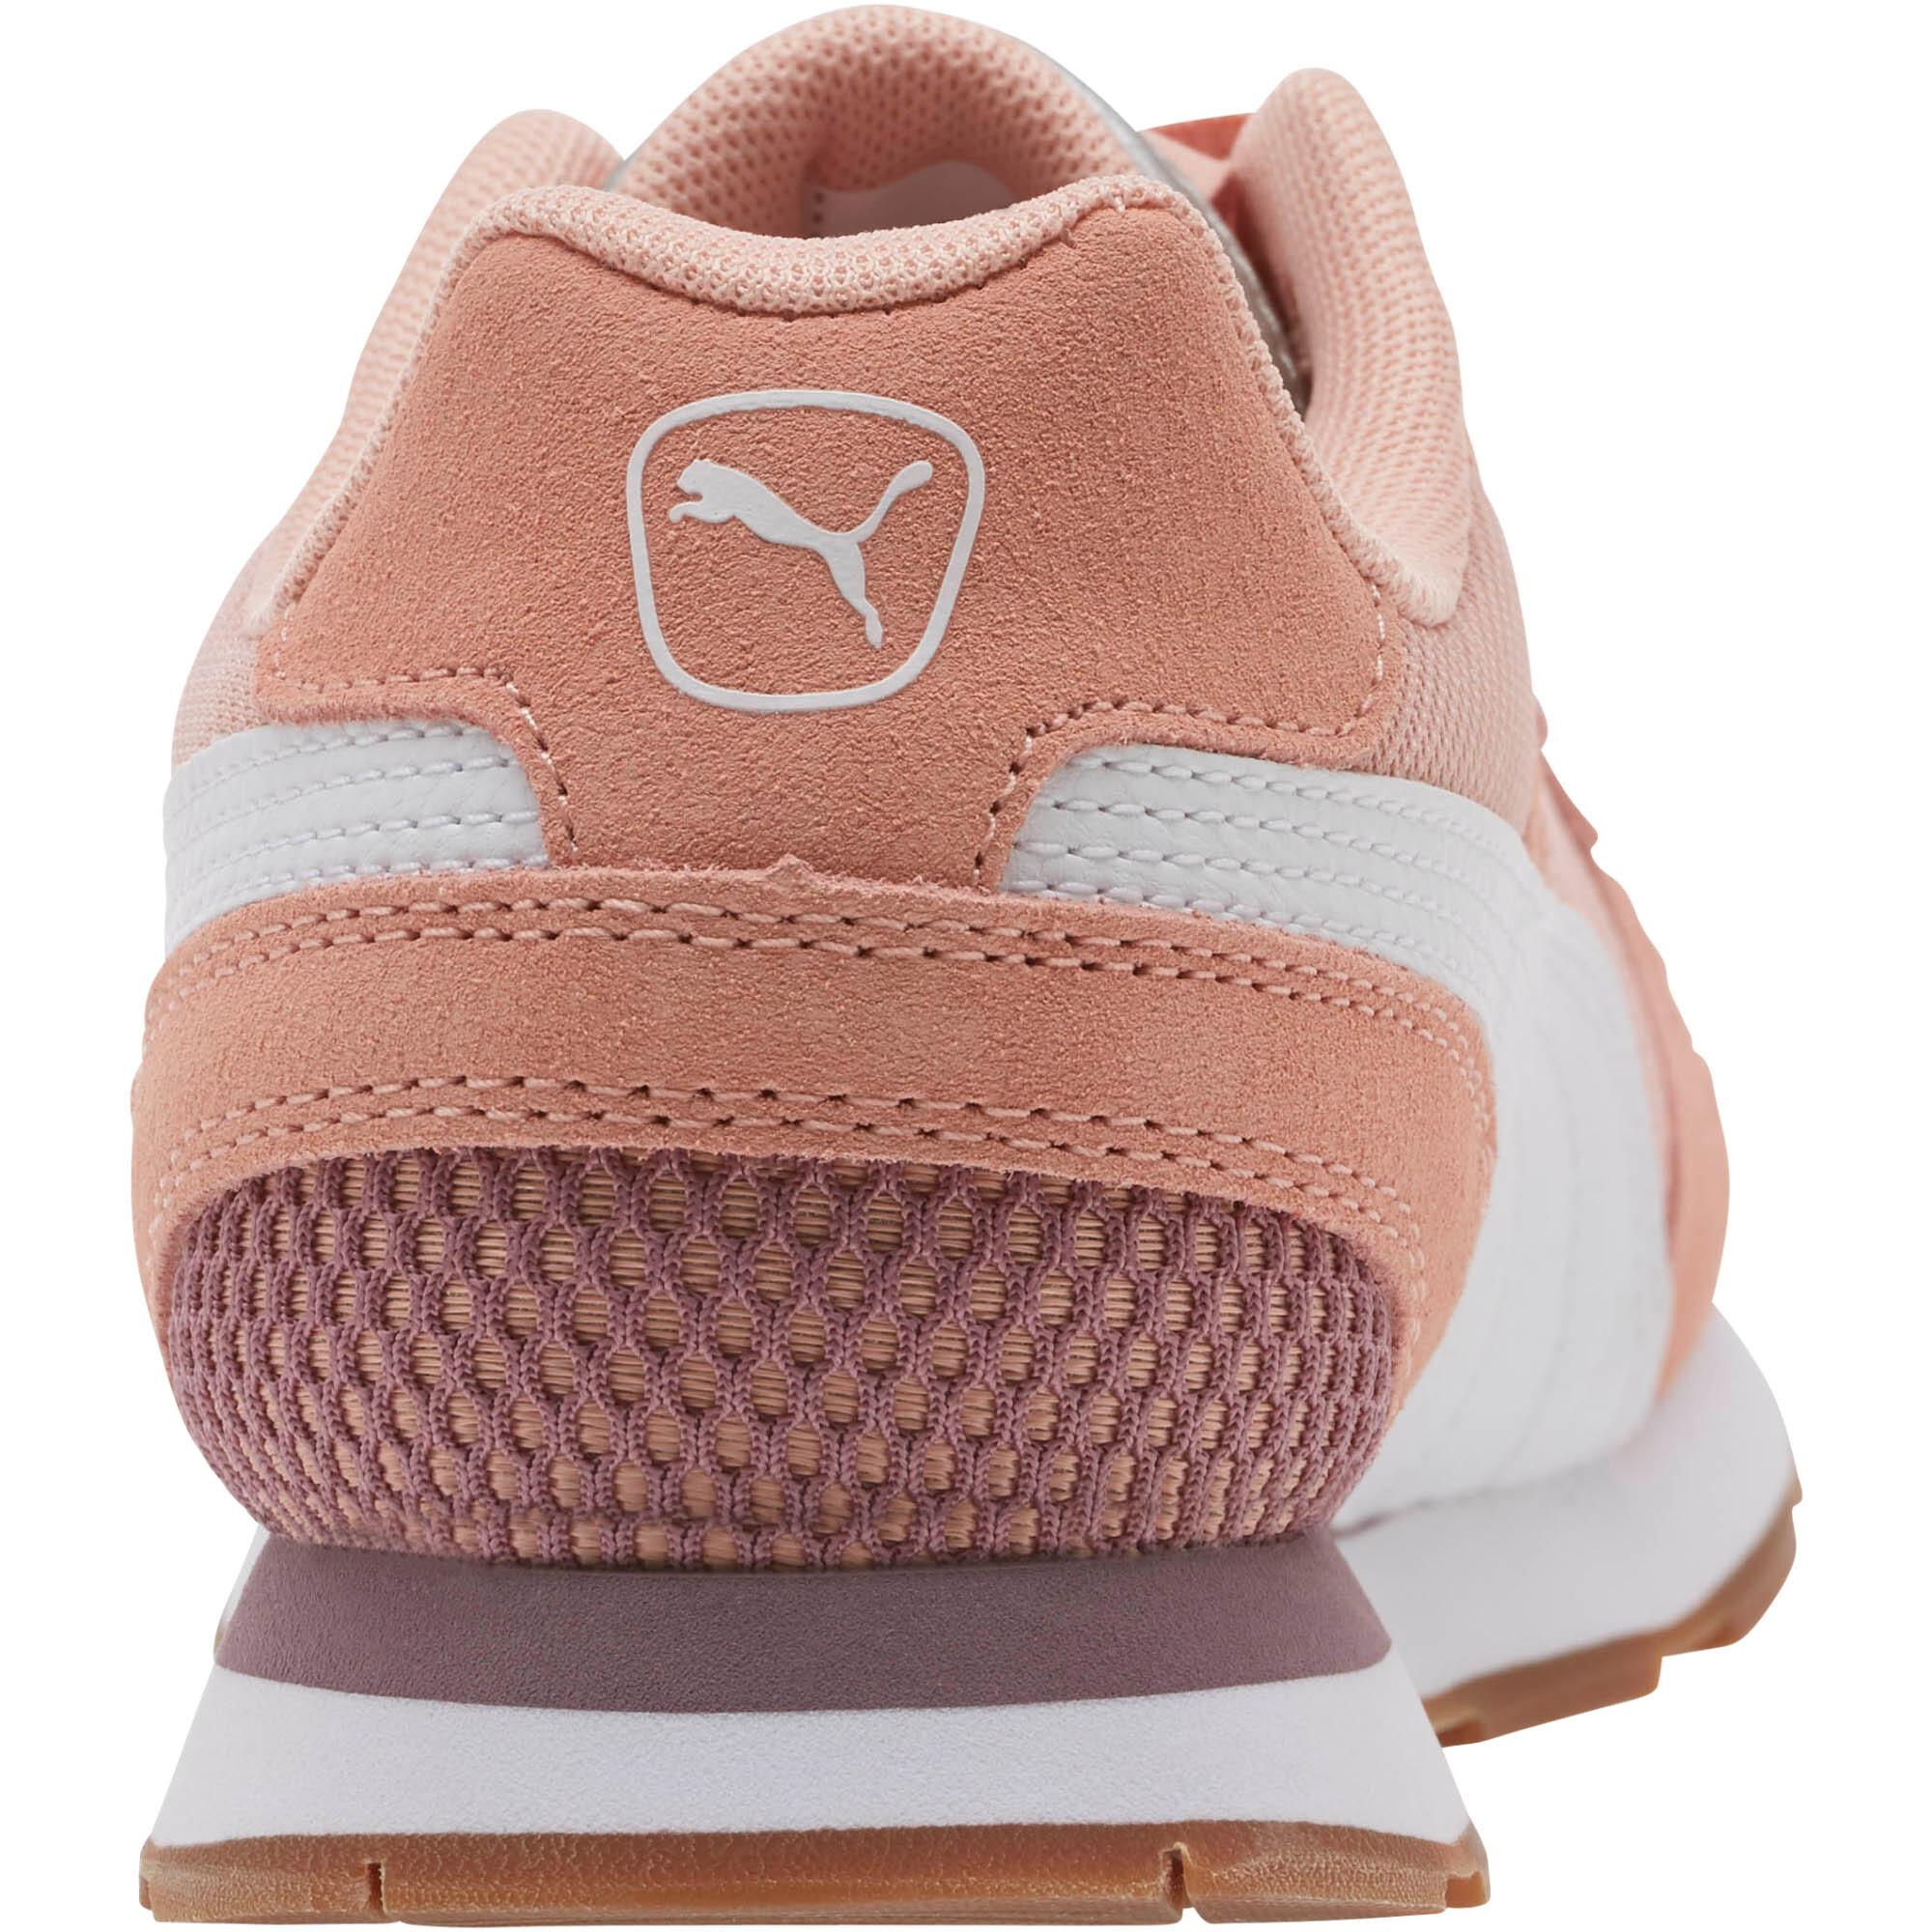 PUMA-Vista-Women-s-Sneakers-Women-Shoe-Basics thumbnail 13